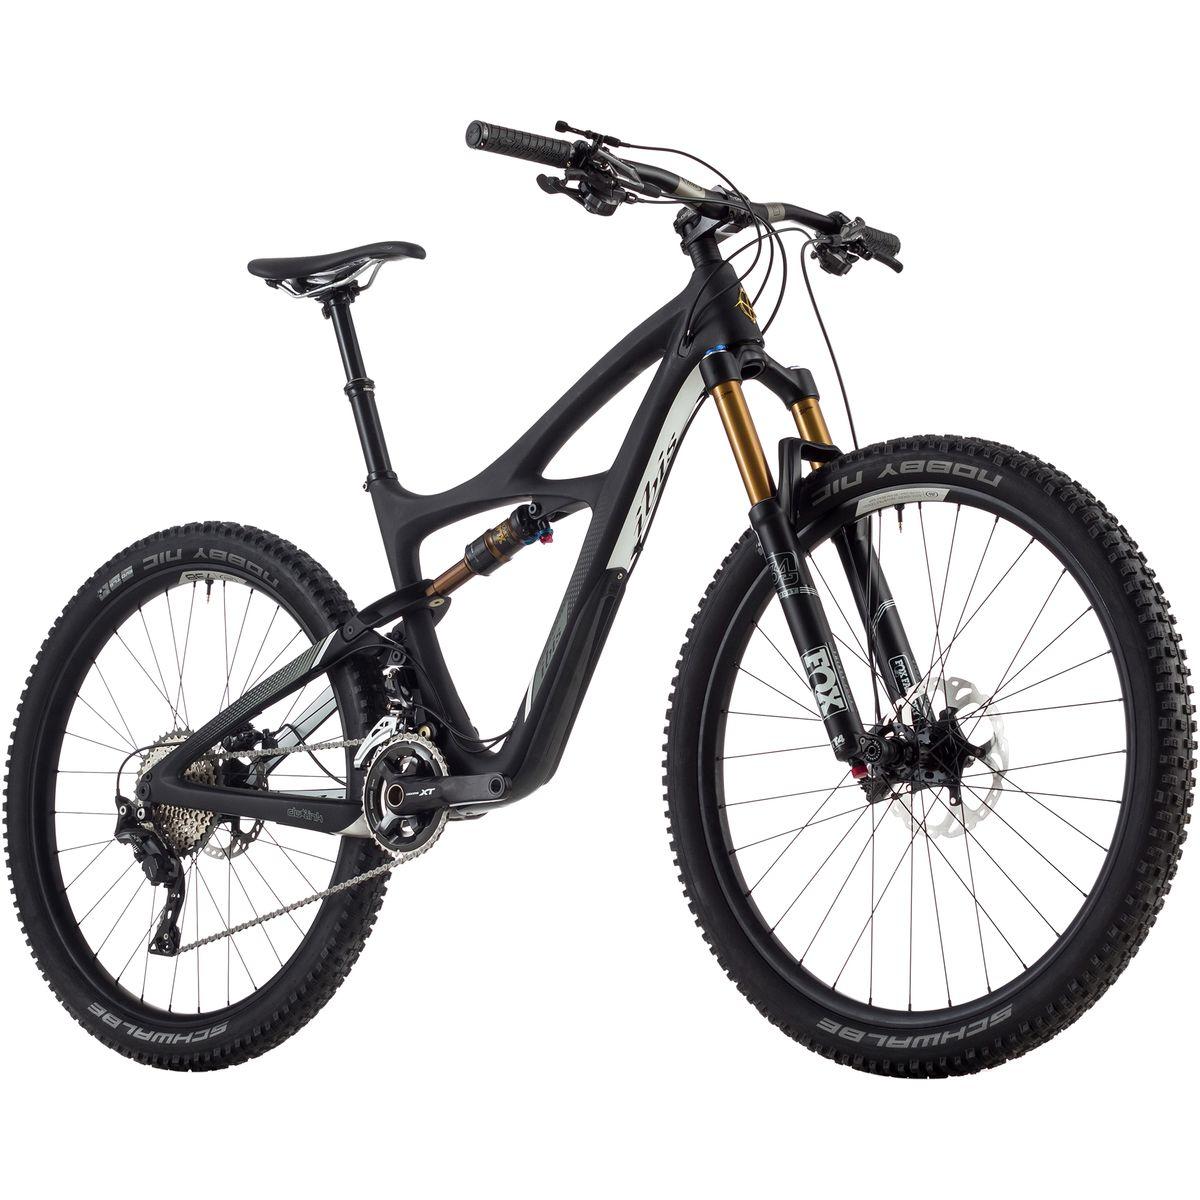 1200x1200 Ibis Mojo 3 Carbon Xt 2x Complete Mountain Bike